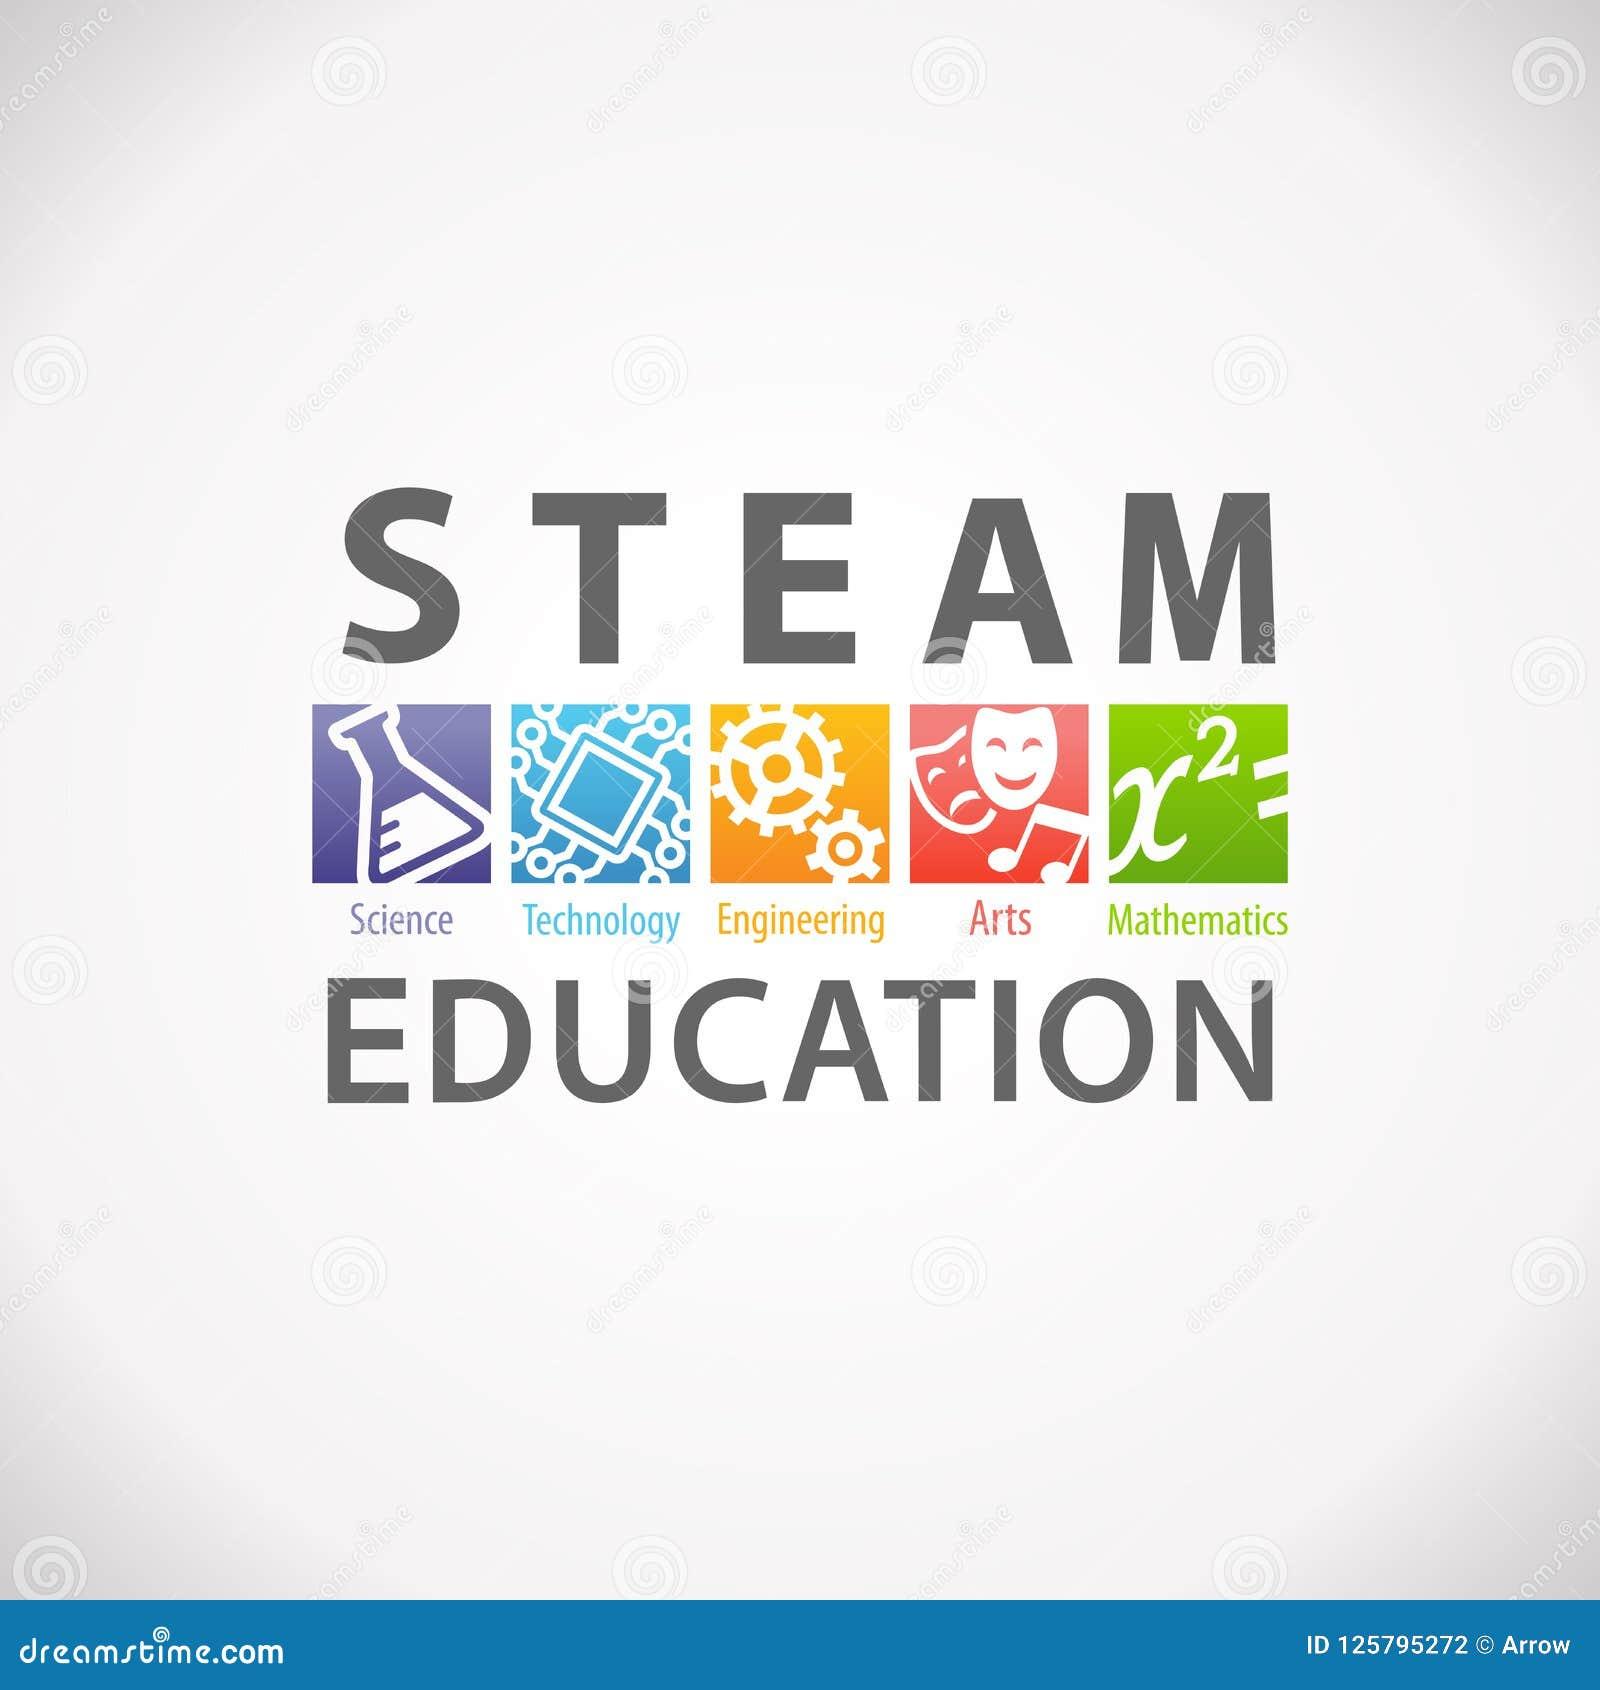 Steam Stem Education Logo Science Technology Engineering Arts Mathematics Stock Vector Illustration Of Math Academic 125795272